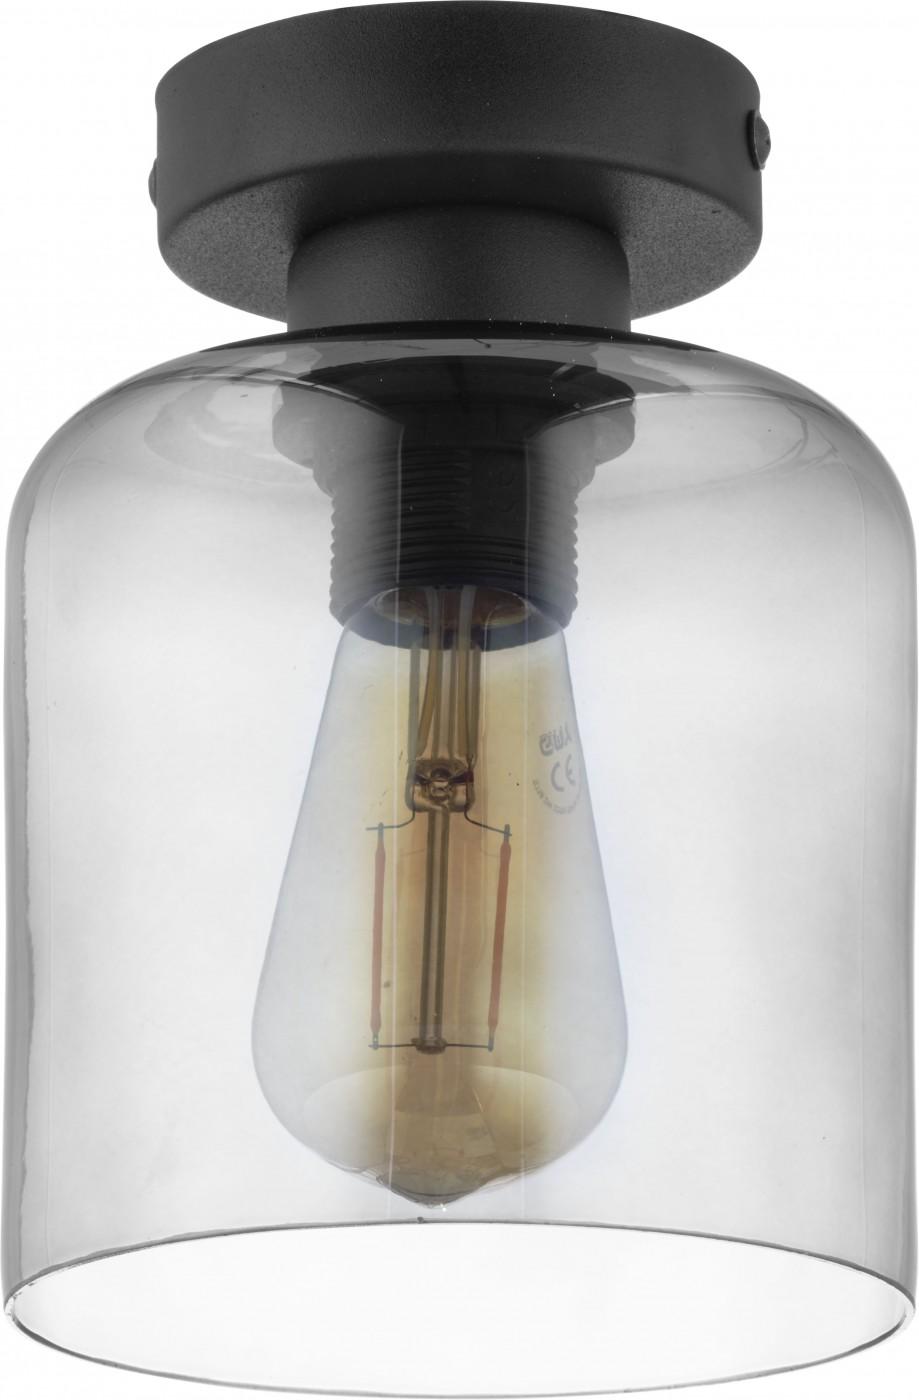 TK Lighting TK-2739 Sintra mennyezeti lámpa